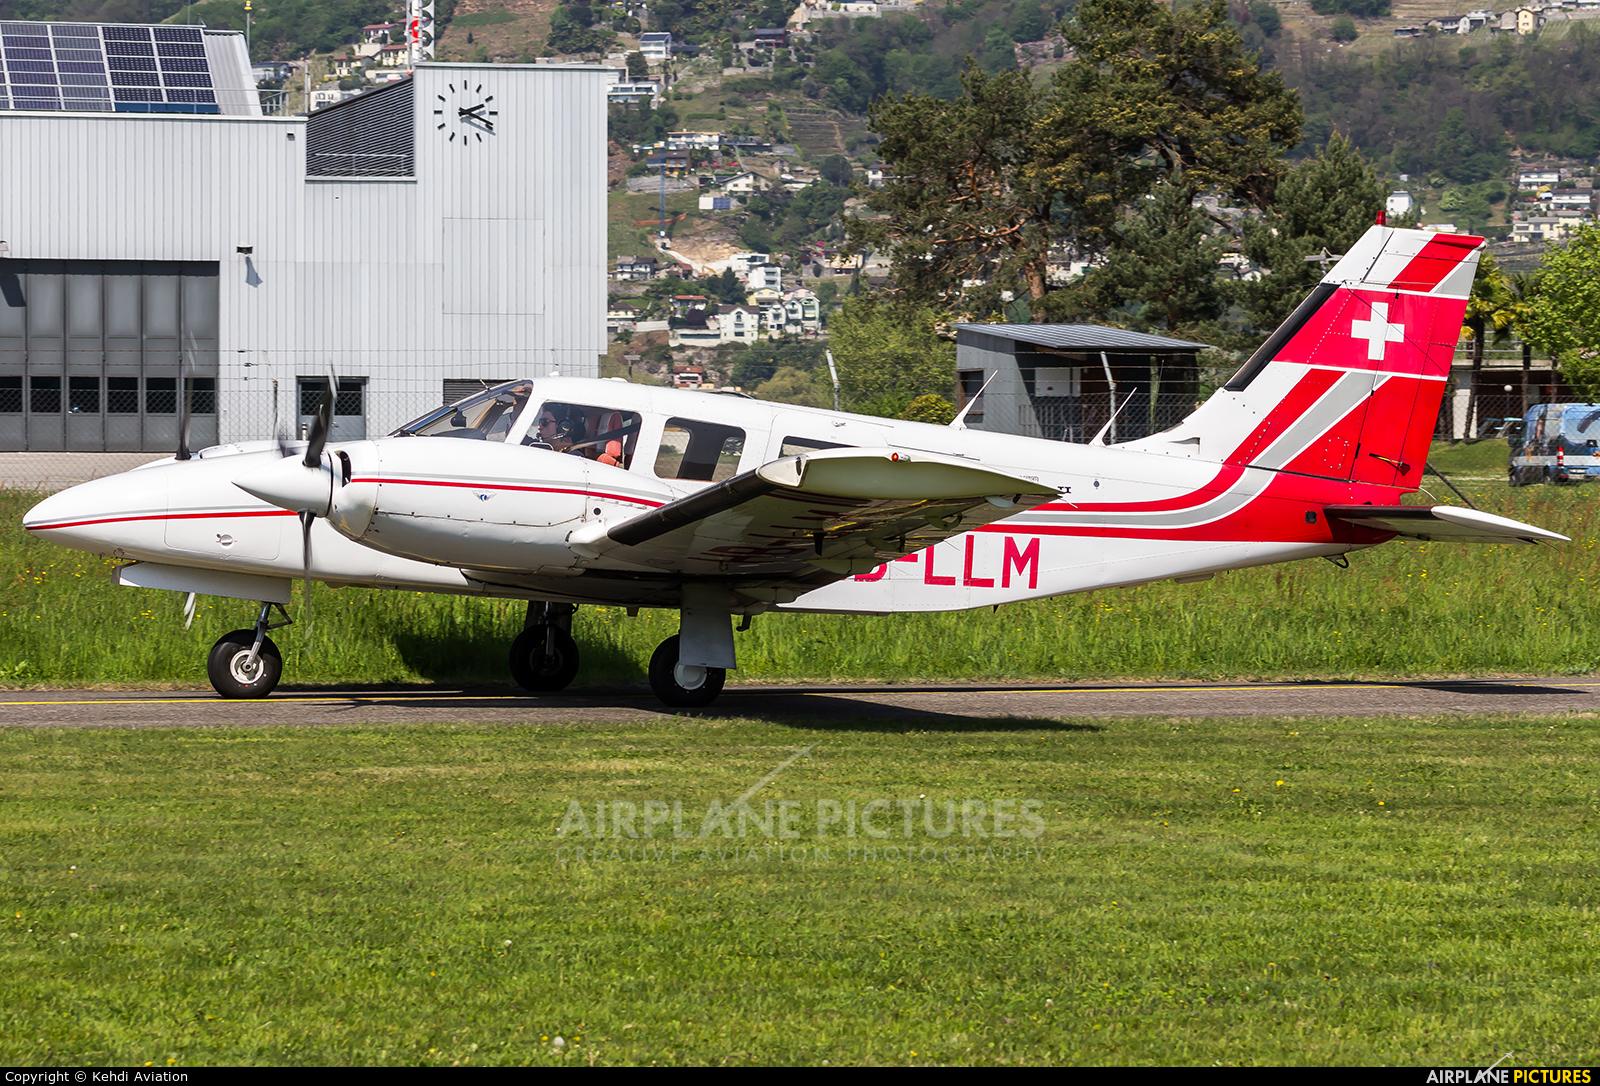 Private HB-LLM aircraft at Locarno